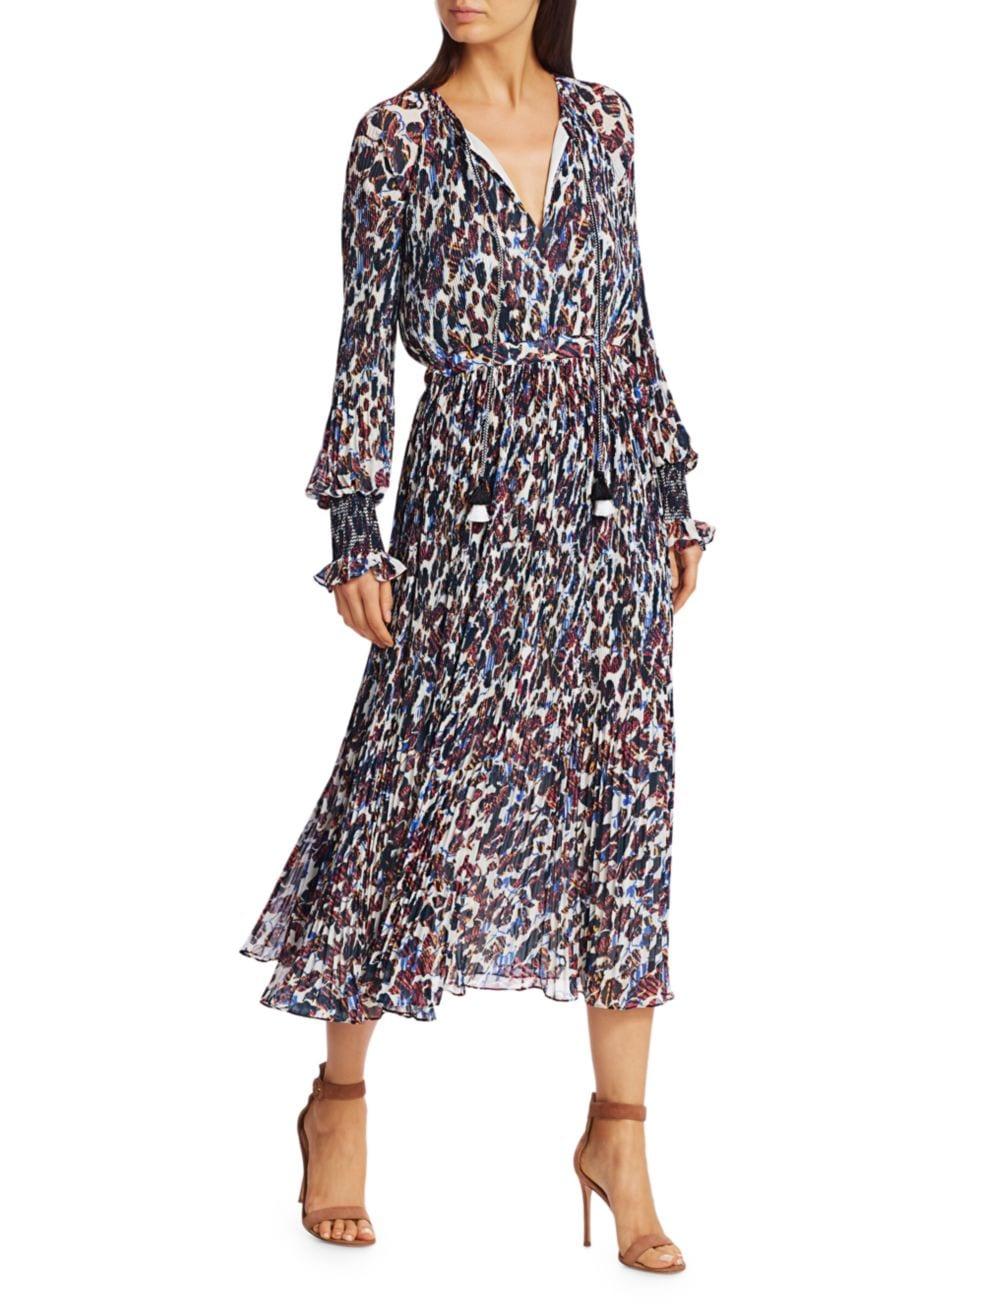 Derek Lam 10 Crosby Nemea Floral Pleated Dress   SaksFifthAvenue